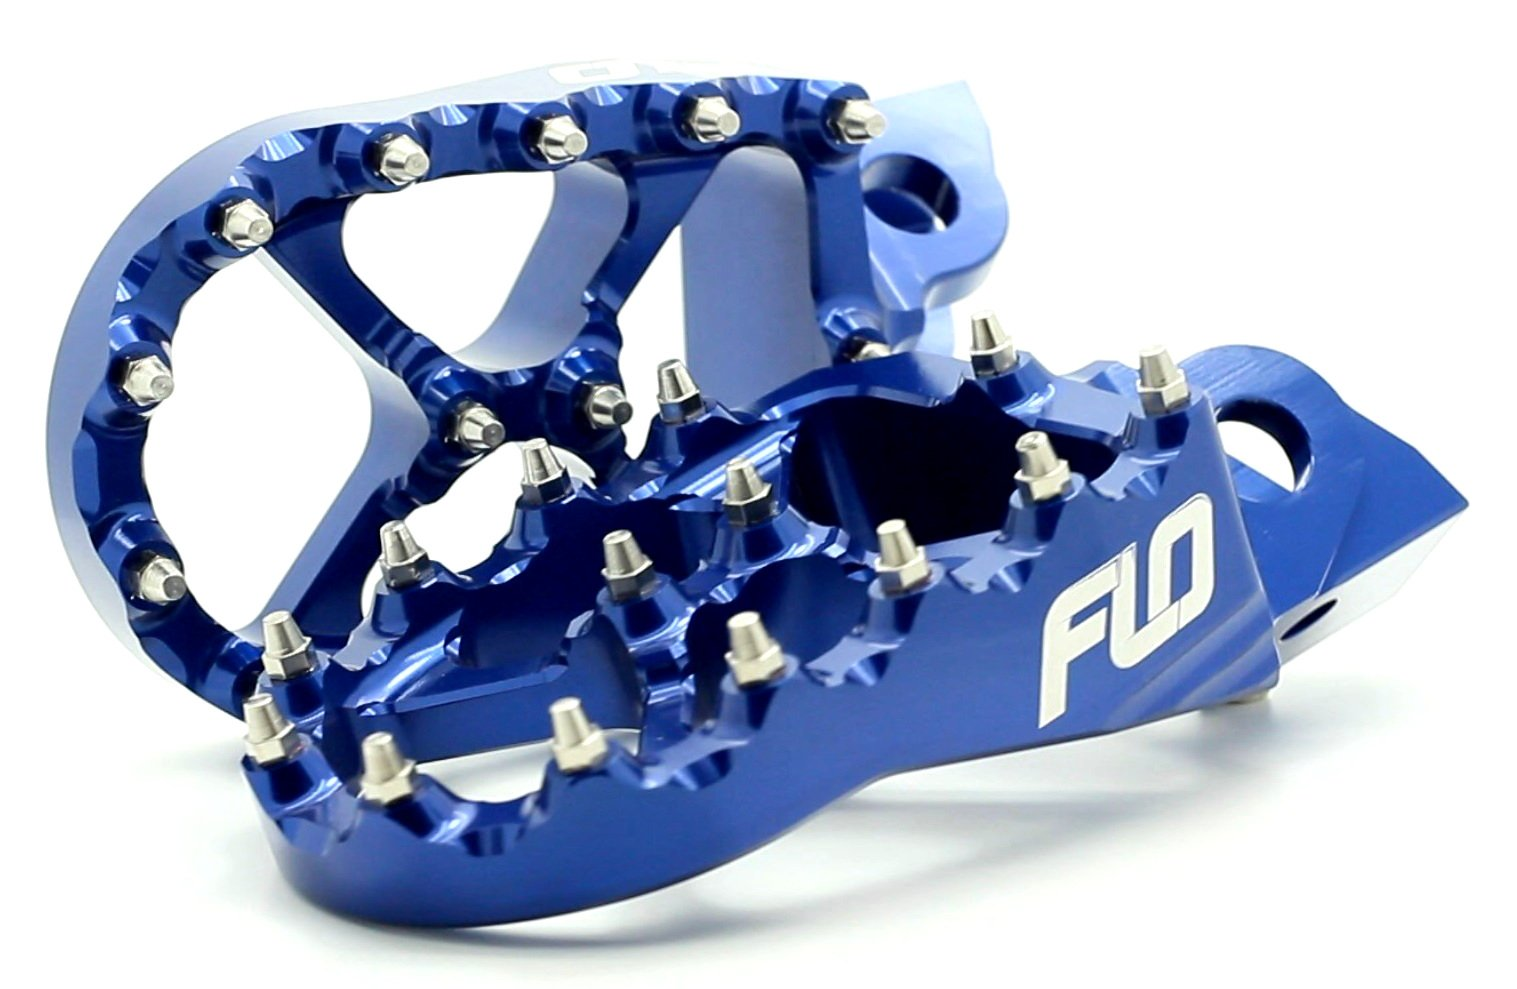 Flo Motorsports CLOSEOUT 2.0 Blue Honda Crf150r, Cr150/250,crf250/450r/x Foot Pegs Fpeg-791blu